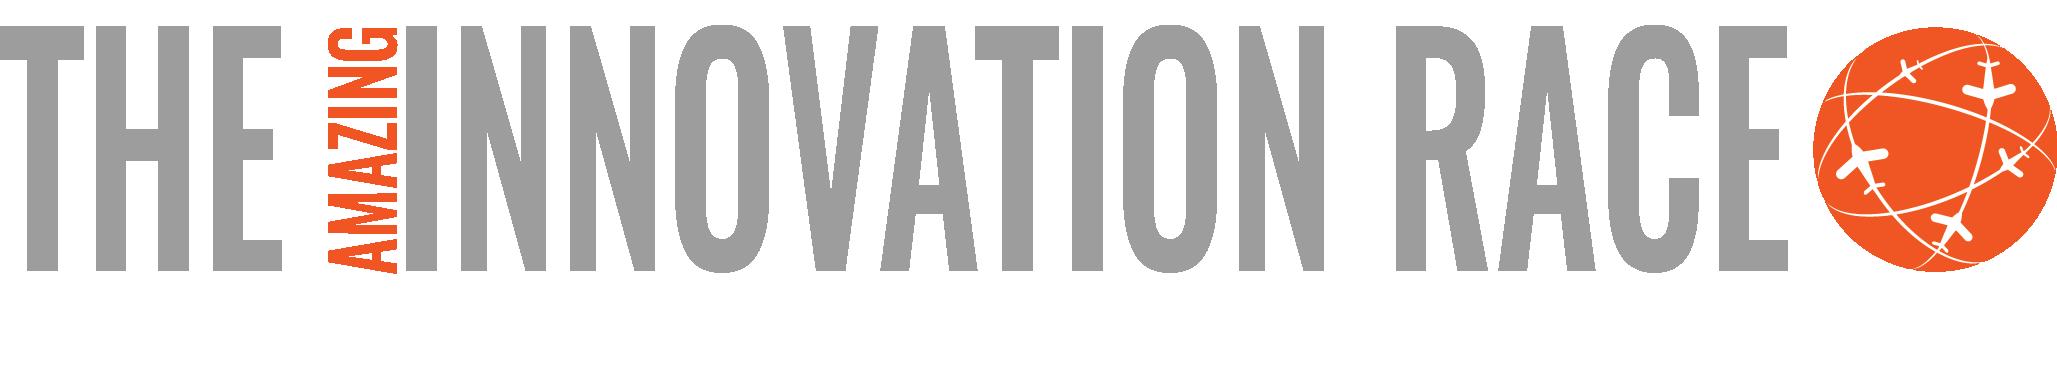 Innovation Race, around the world adventure banner